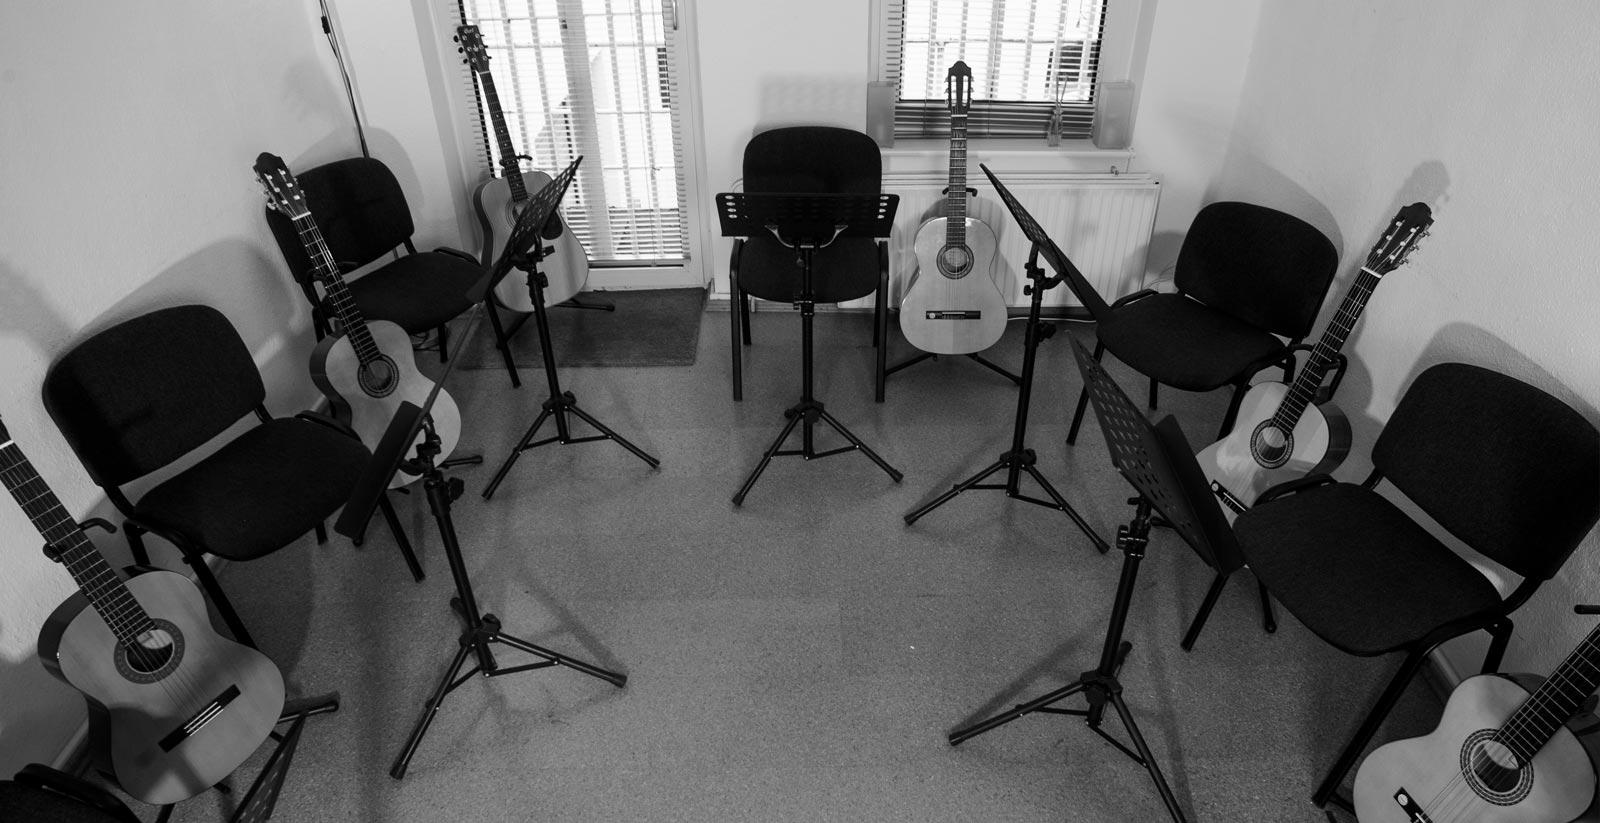 Basic Guitar Workshops - The Guitar School